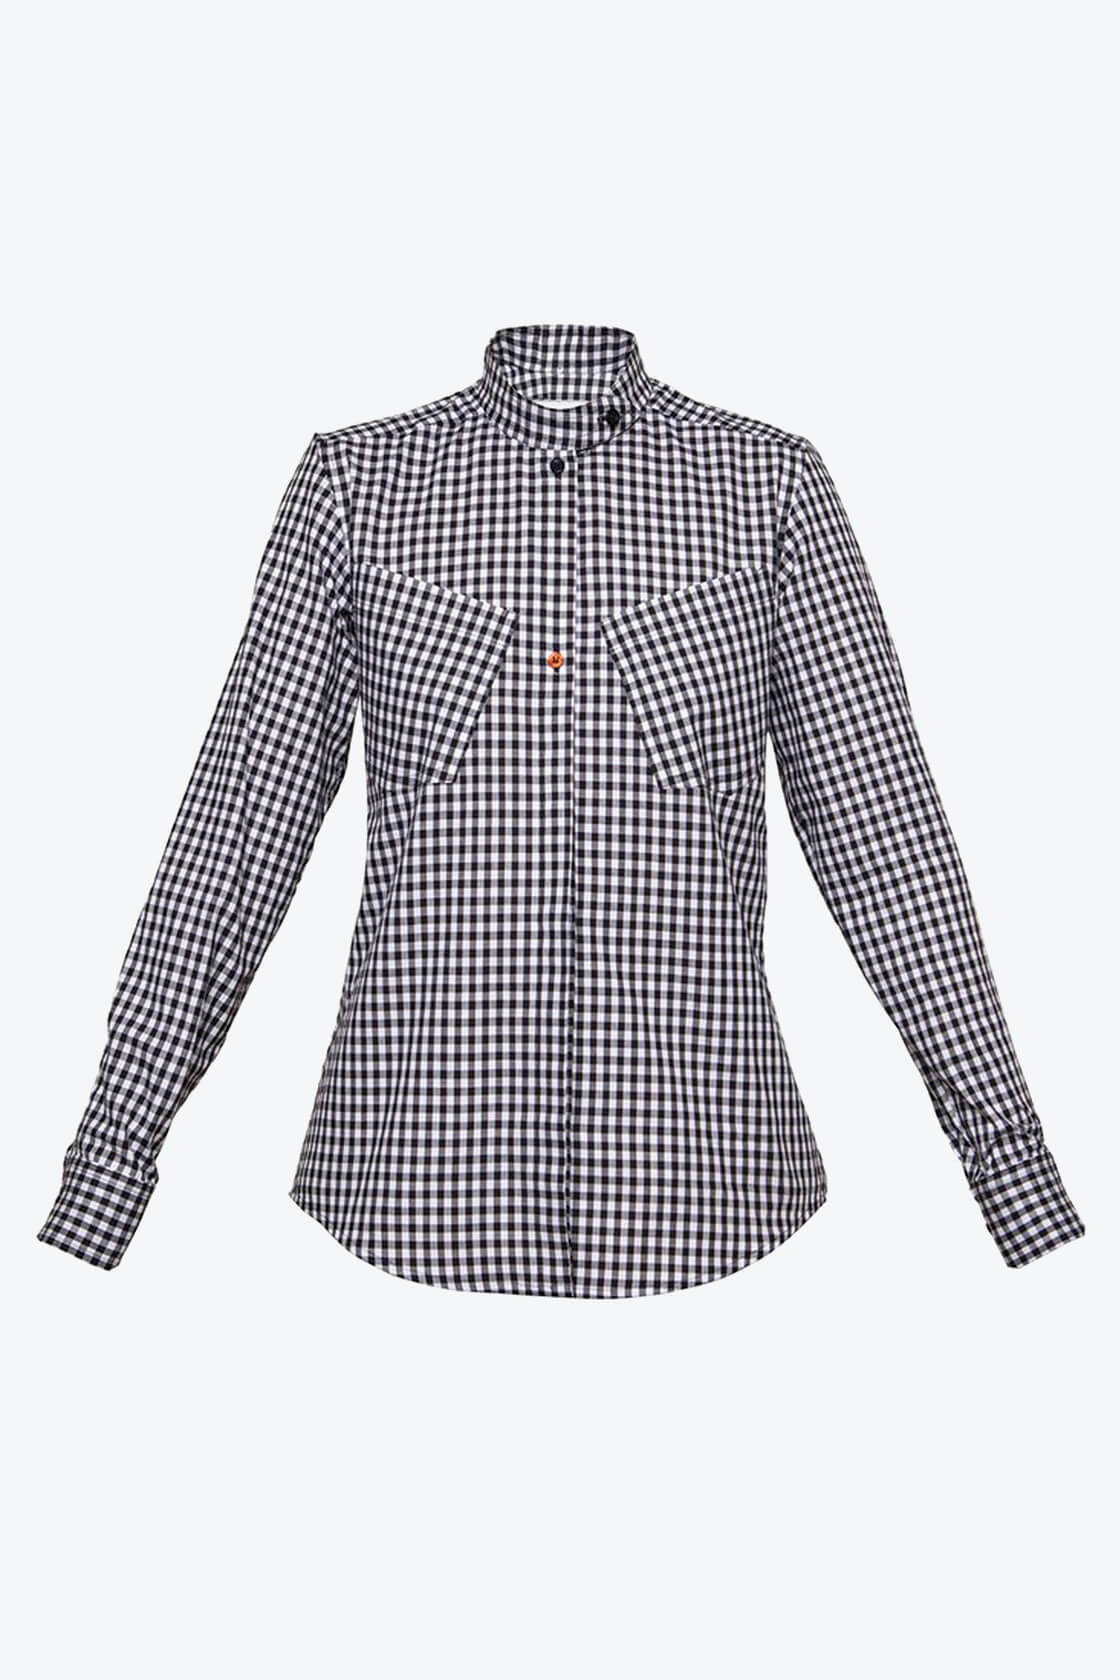 OL10000186 Gingham shirt1